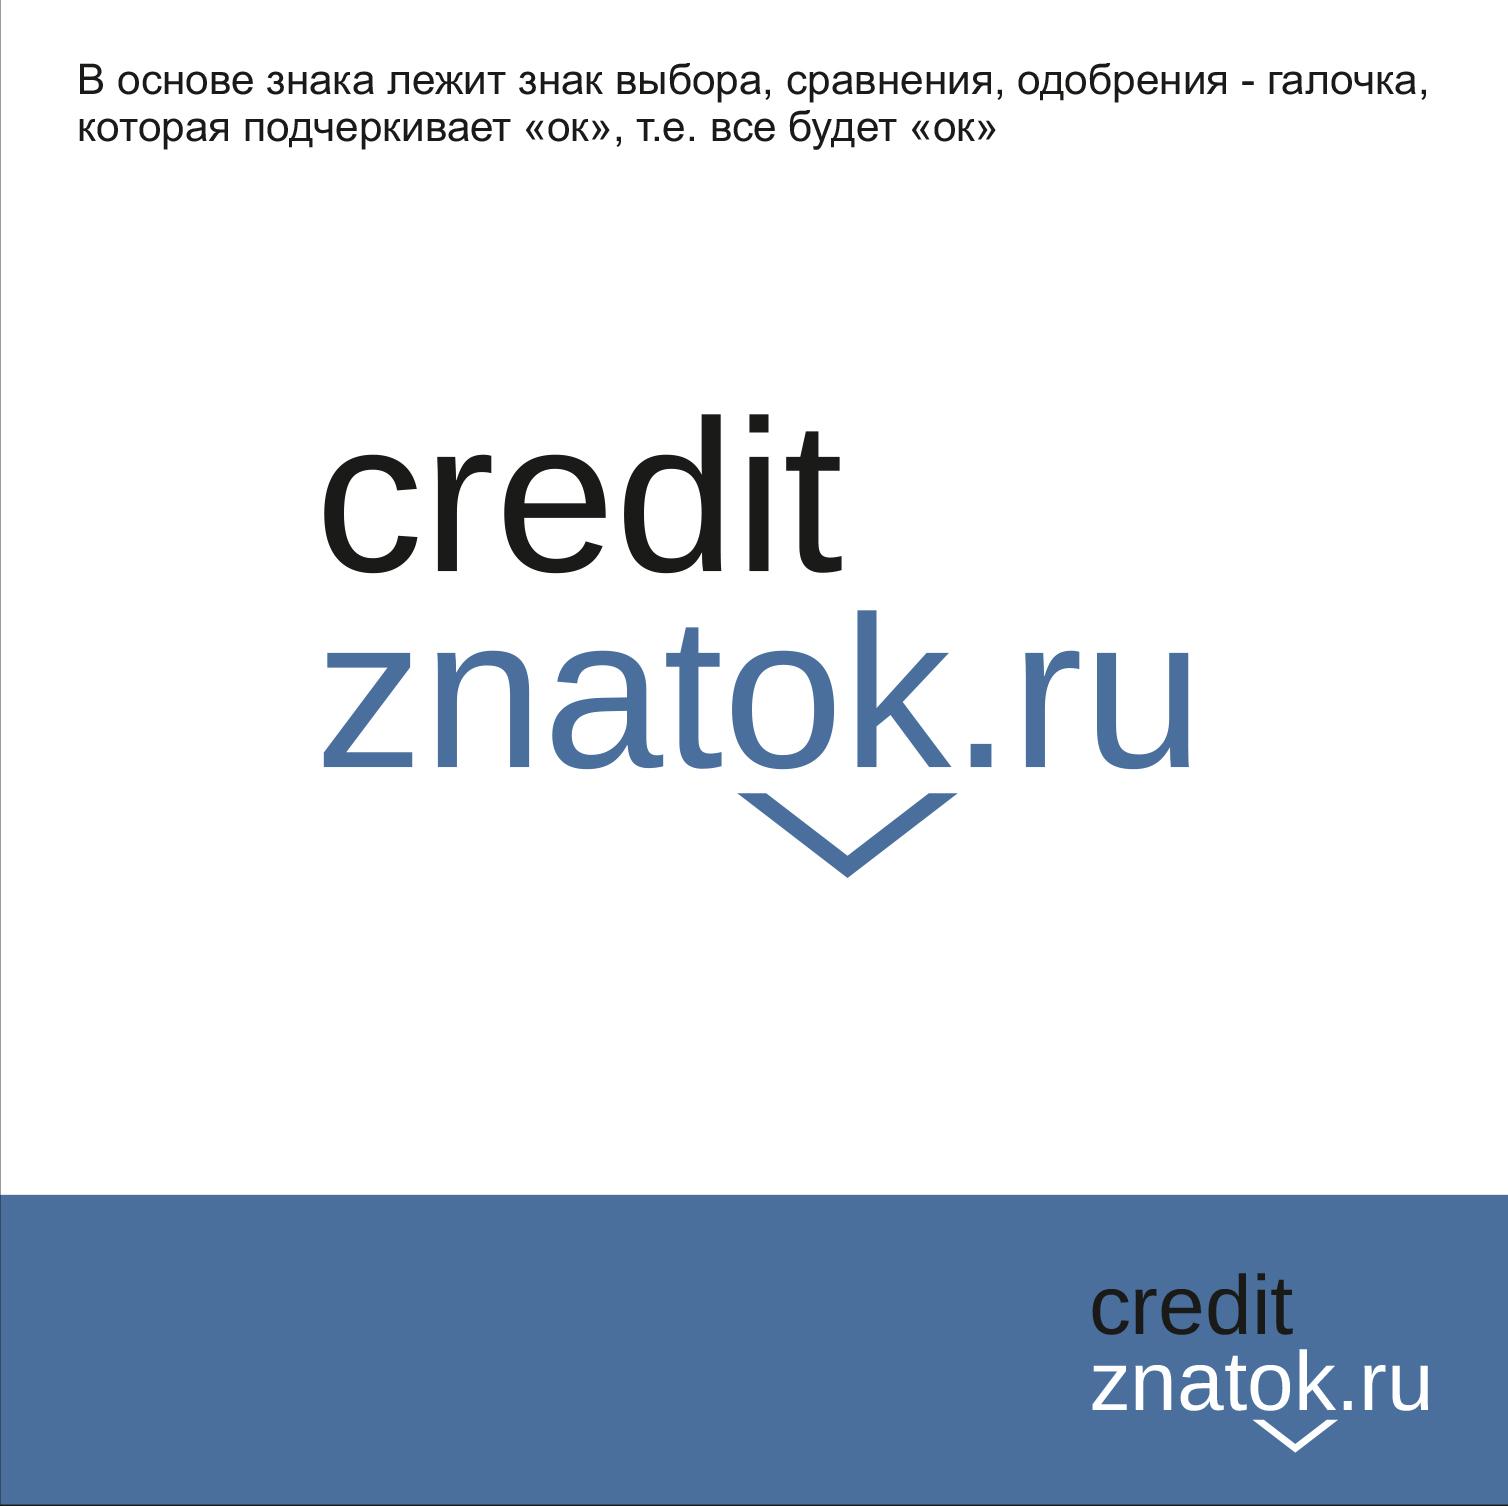 creditznatok.ru - логотип фото f_3975899eceecba5e.jpg